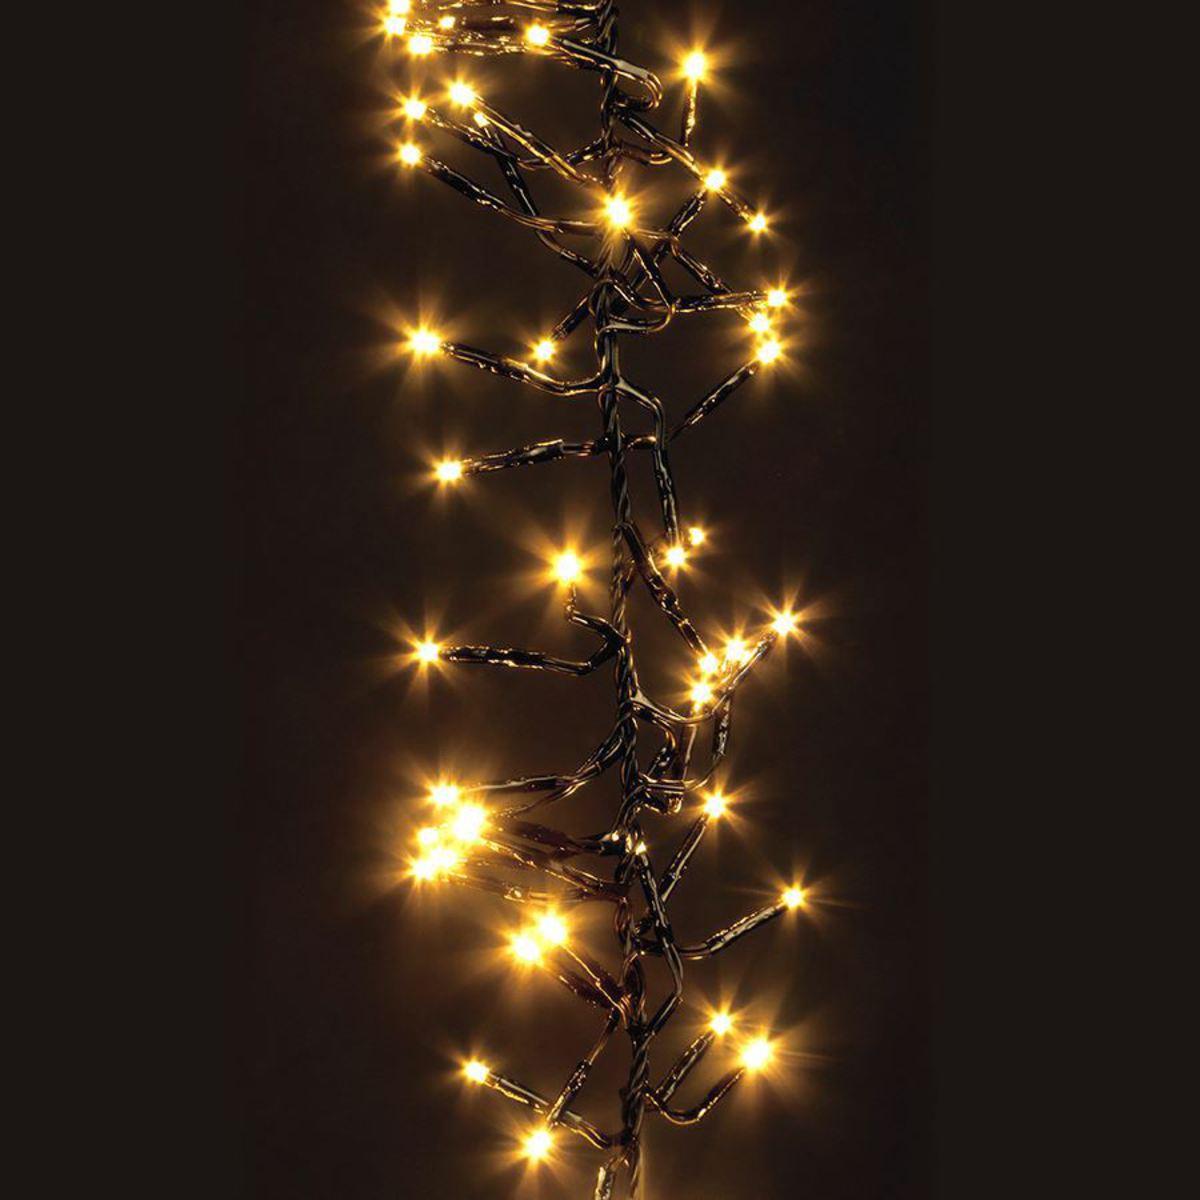 Bild 3 von LED-Cluster-Lichterkette 1152 LEDs